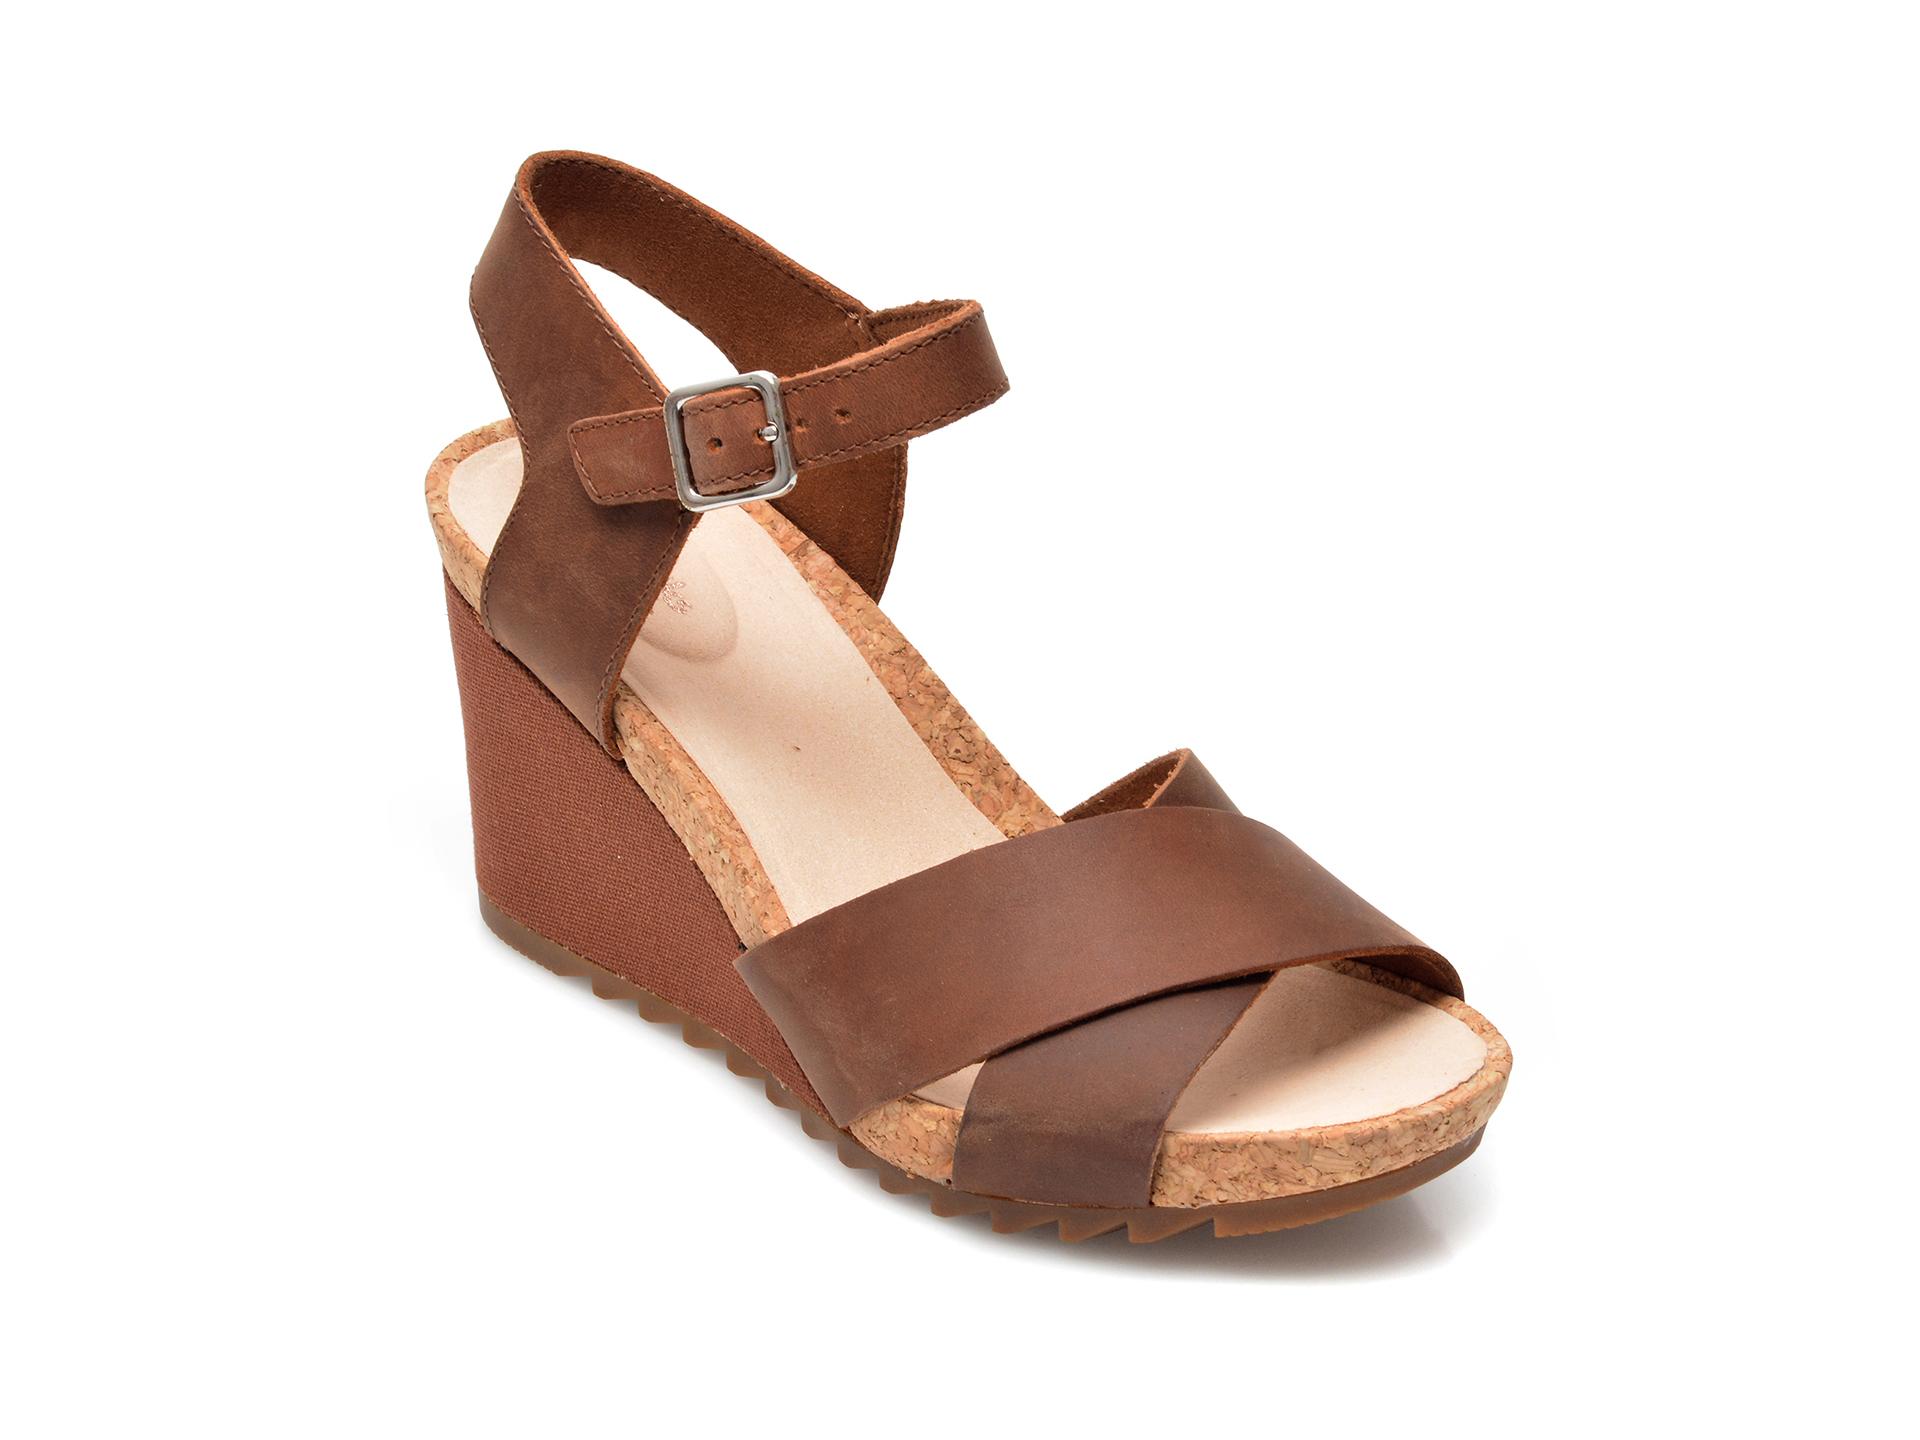 Sandale CLARKS maro, Flex Sun, din nabuc imagine otter.ro 2021